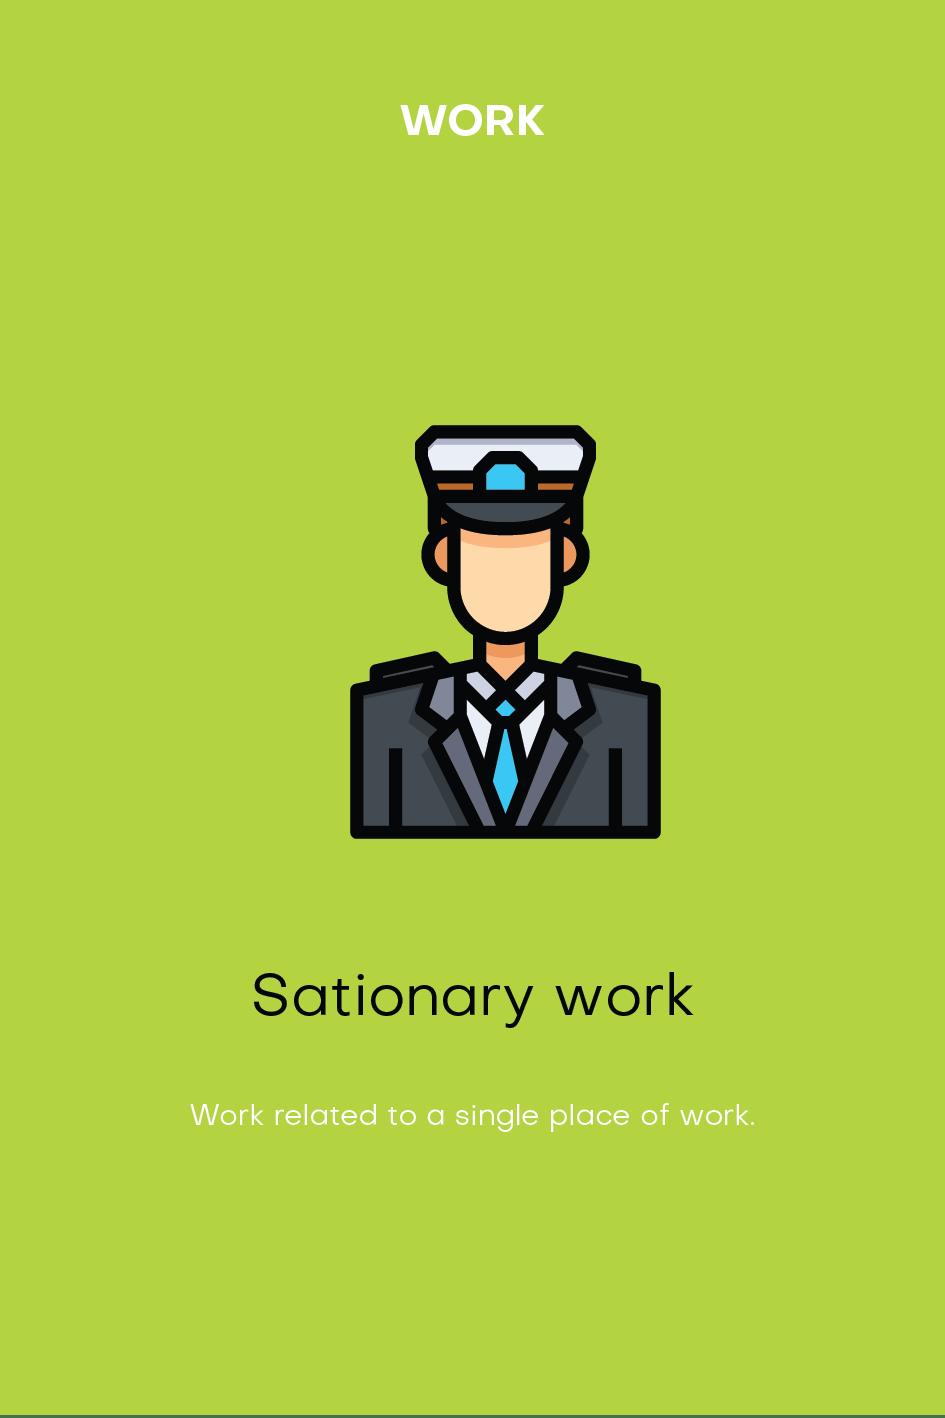 Archetype: Work, Stationary work